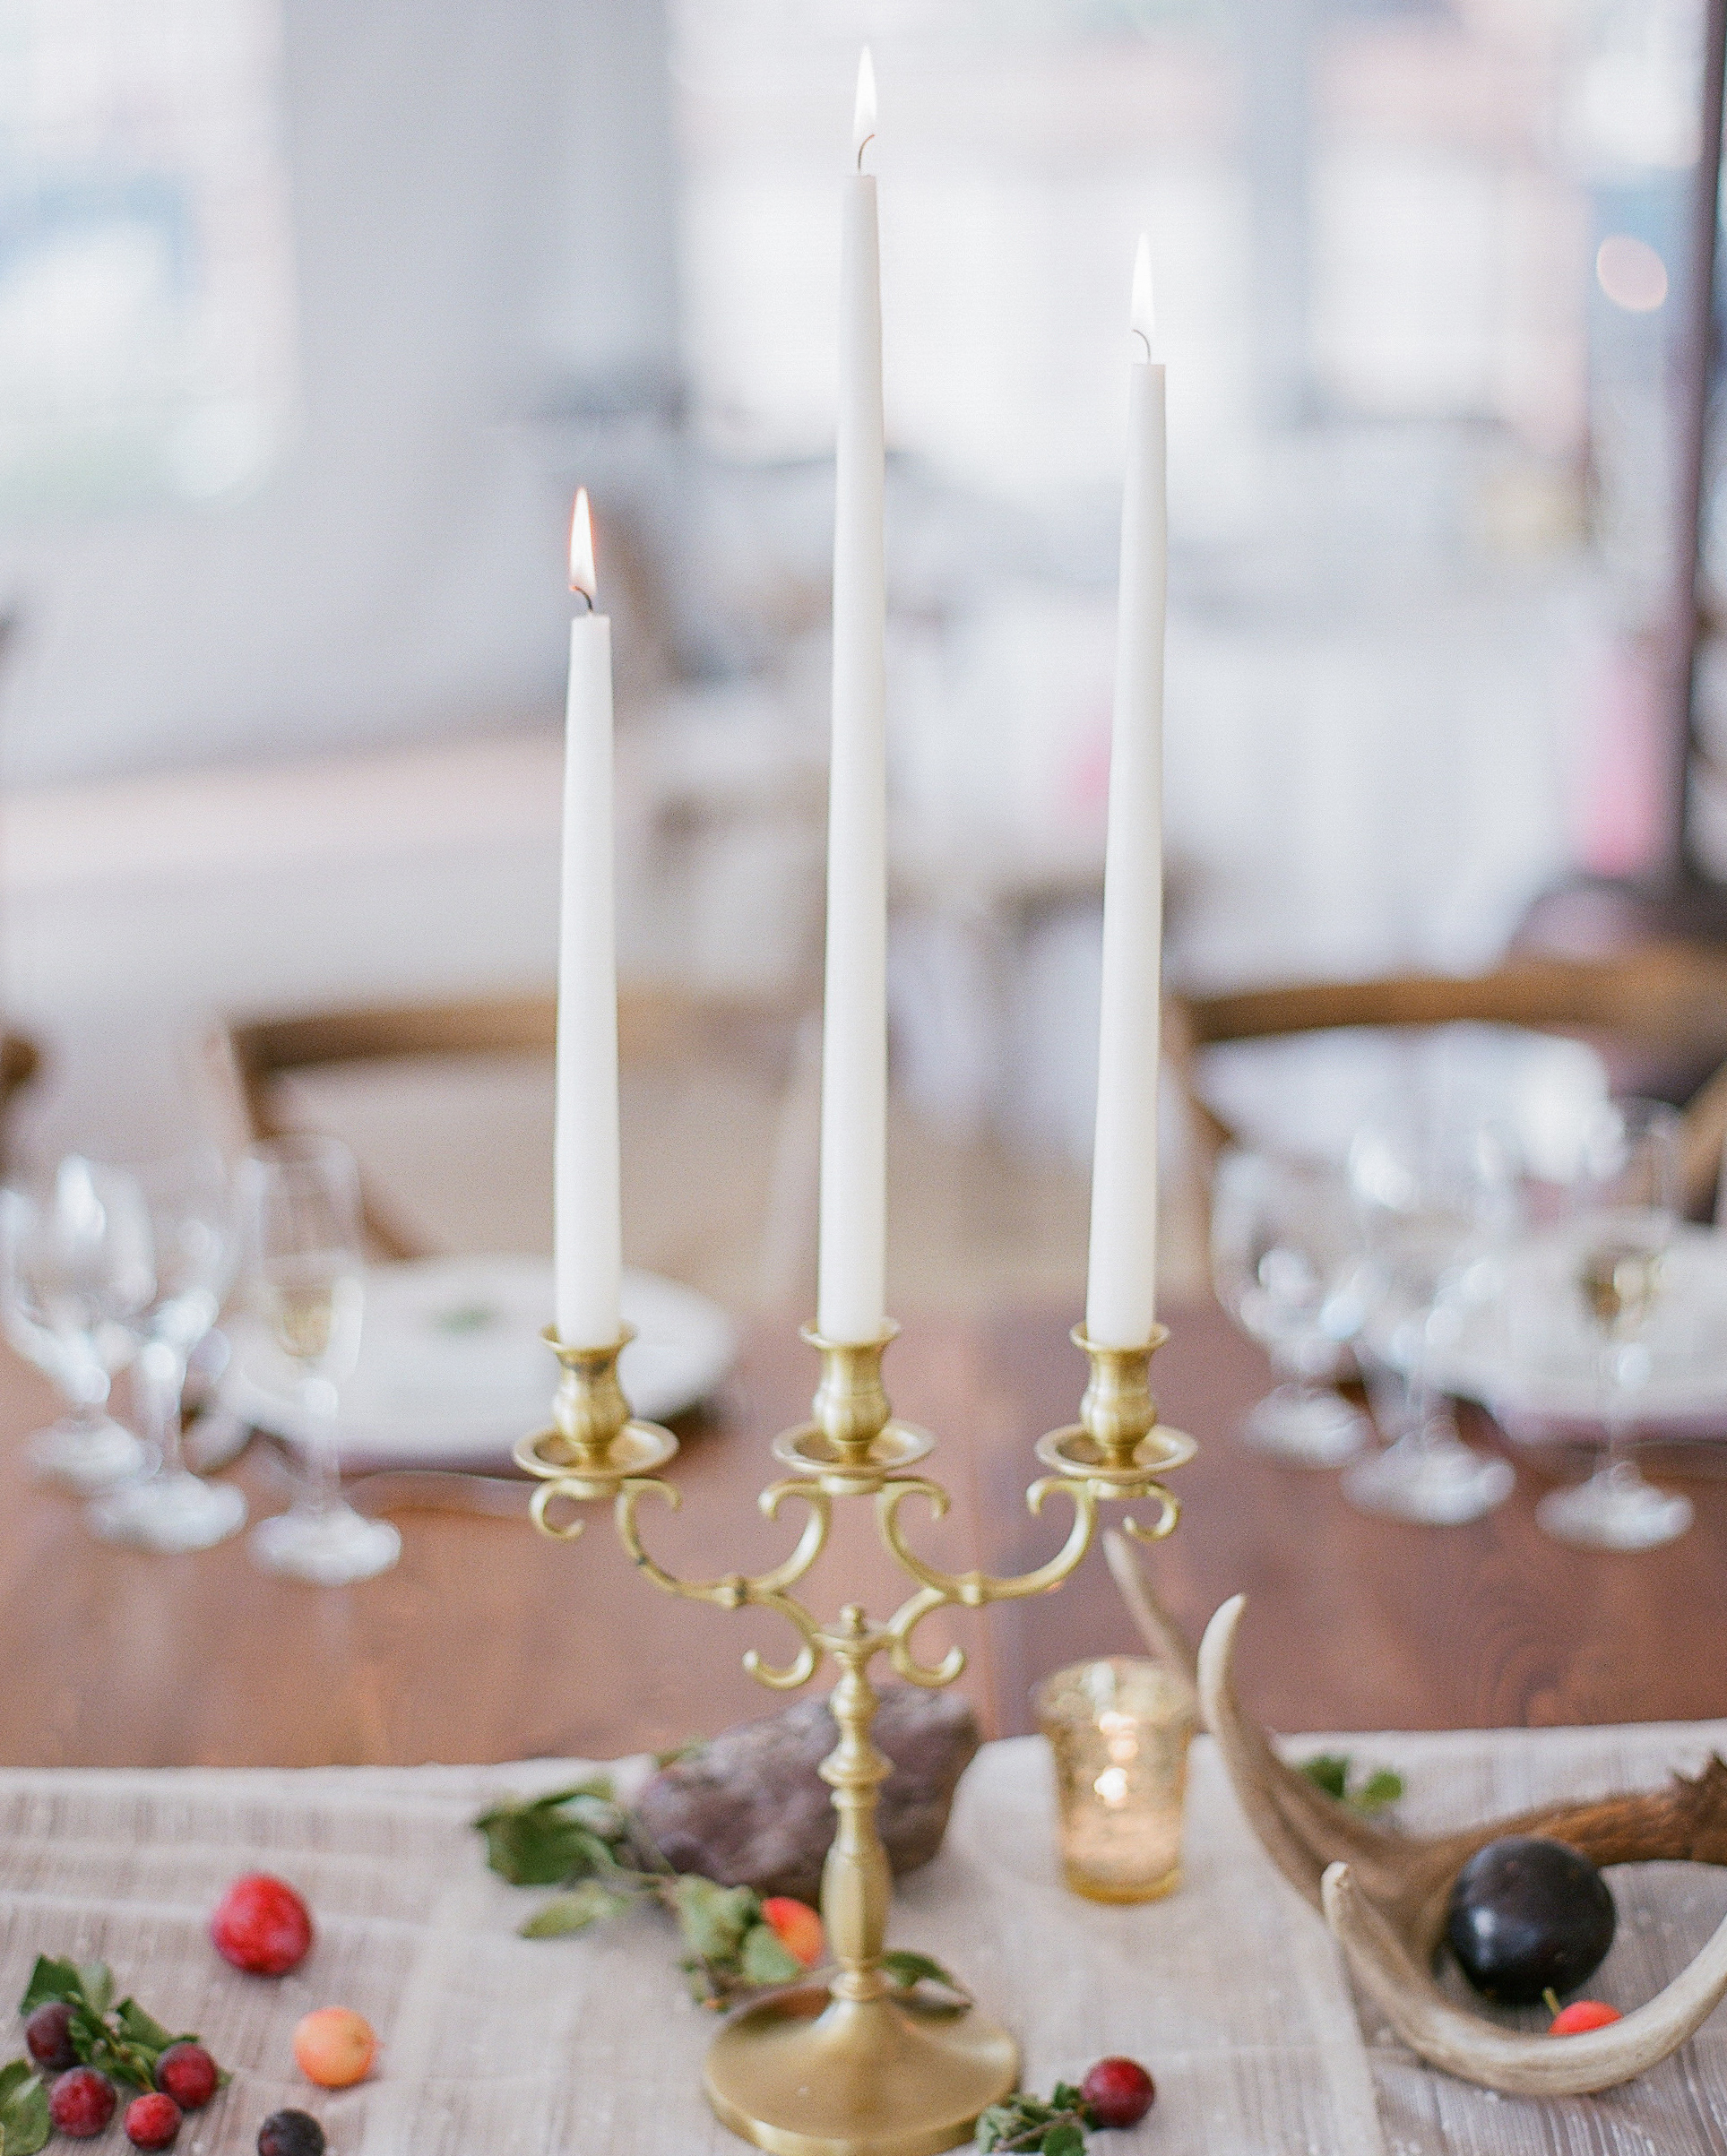 robin-kenny-wedding-candlesticks-021-s112068-0715.jpg